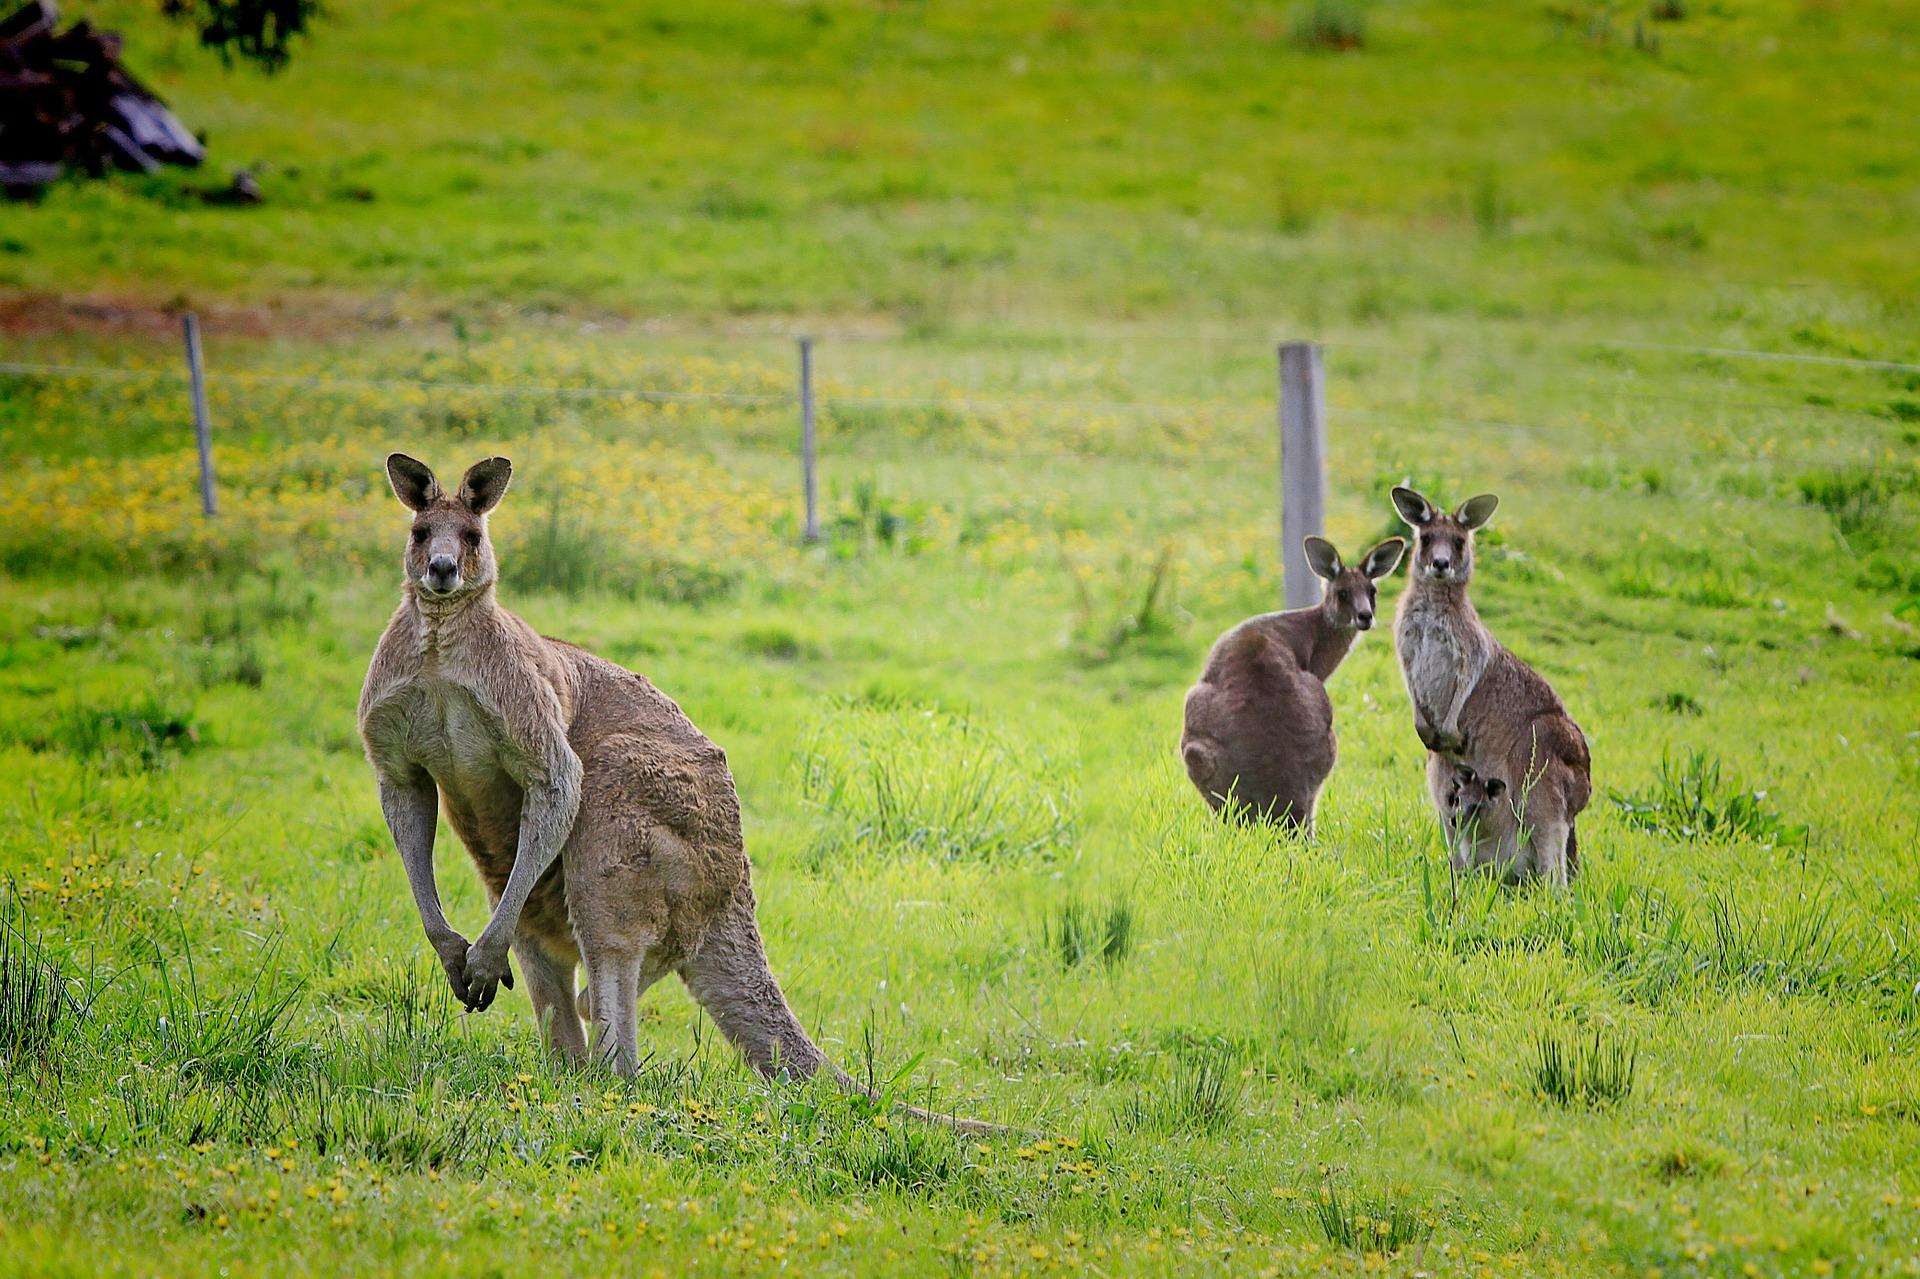 15 myths about australia debunked